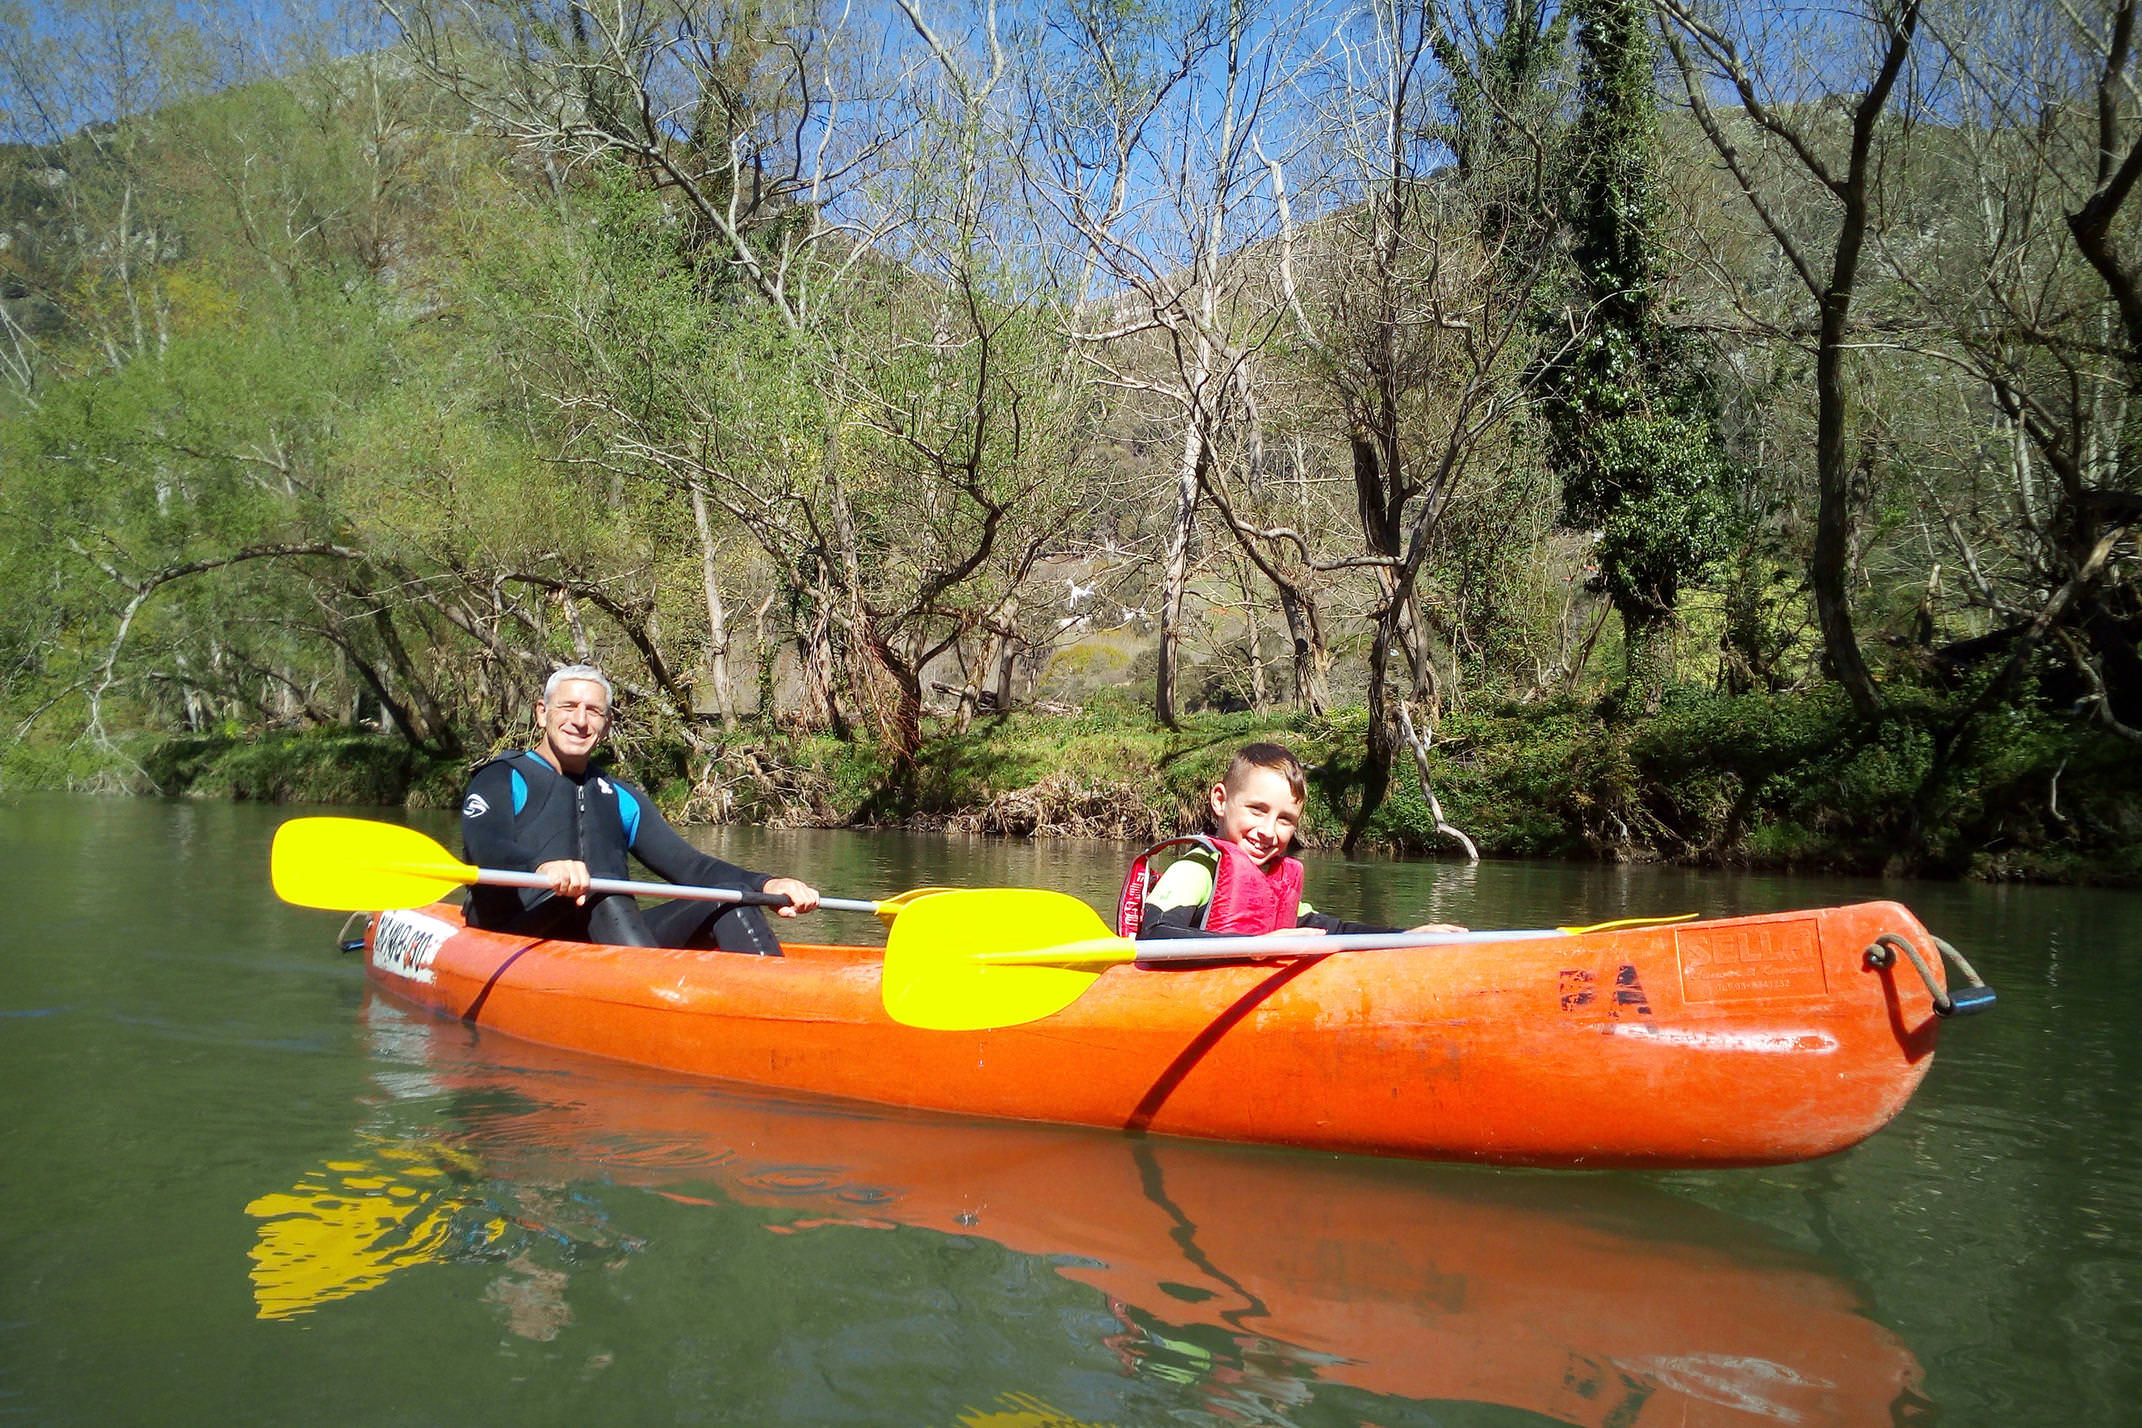 Spain asturias picos deva river family canoeing c diego